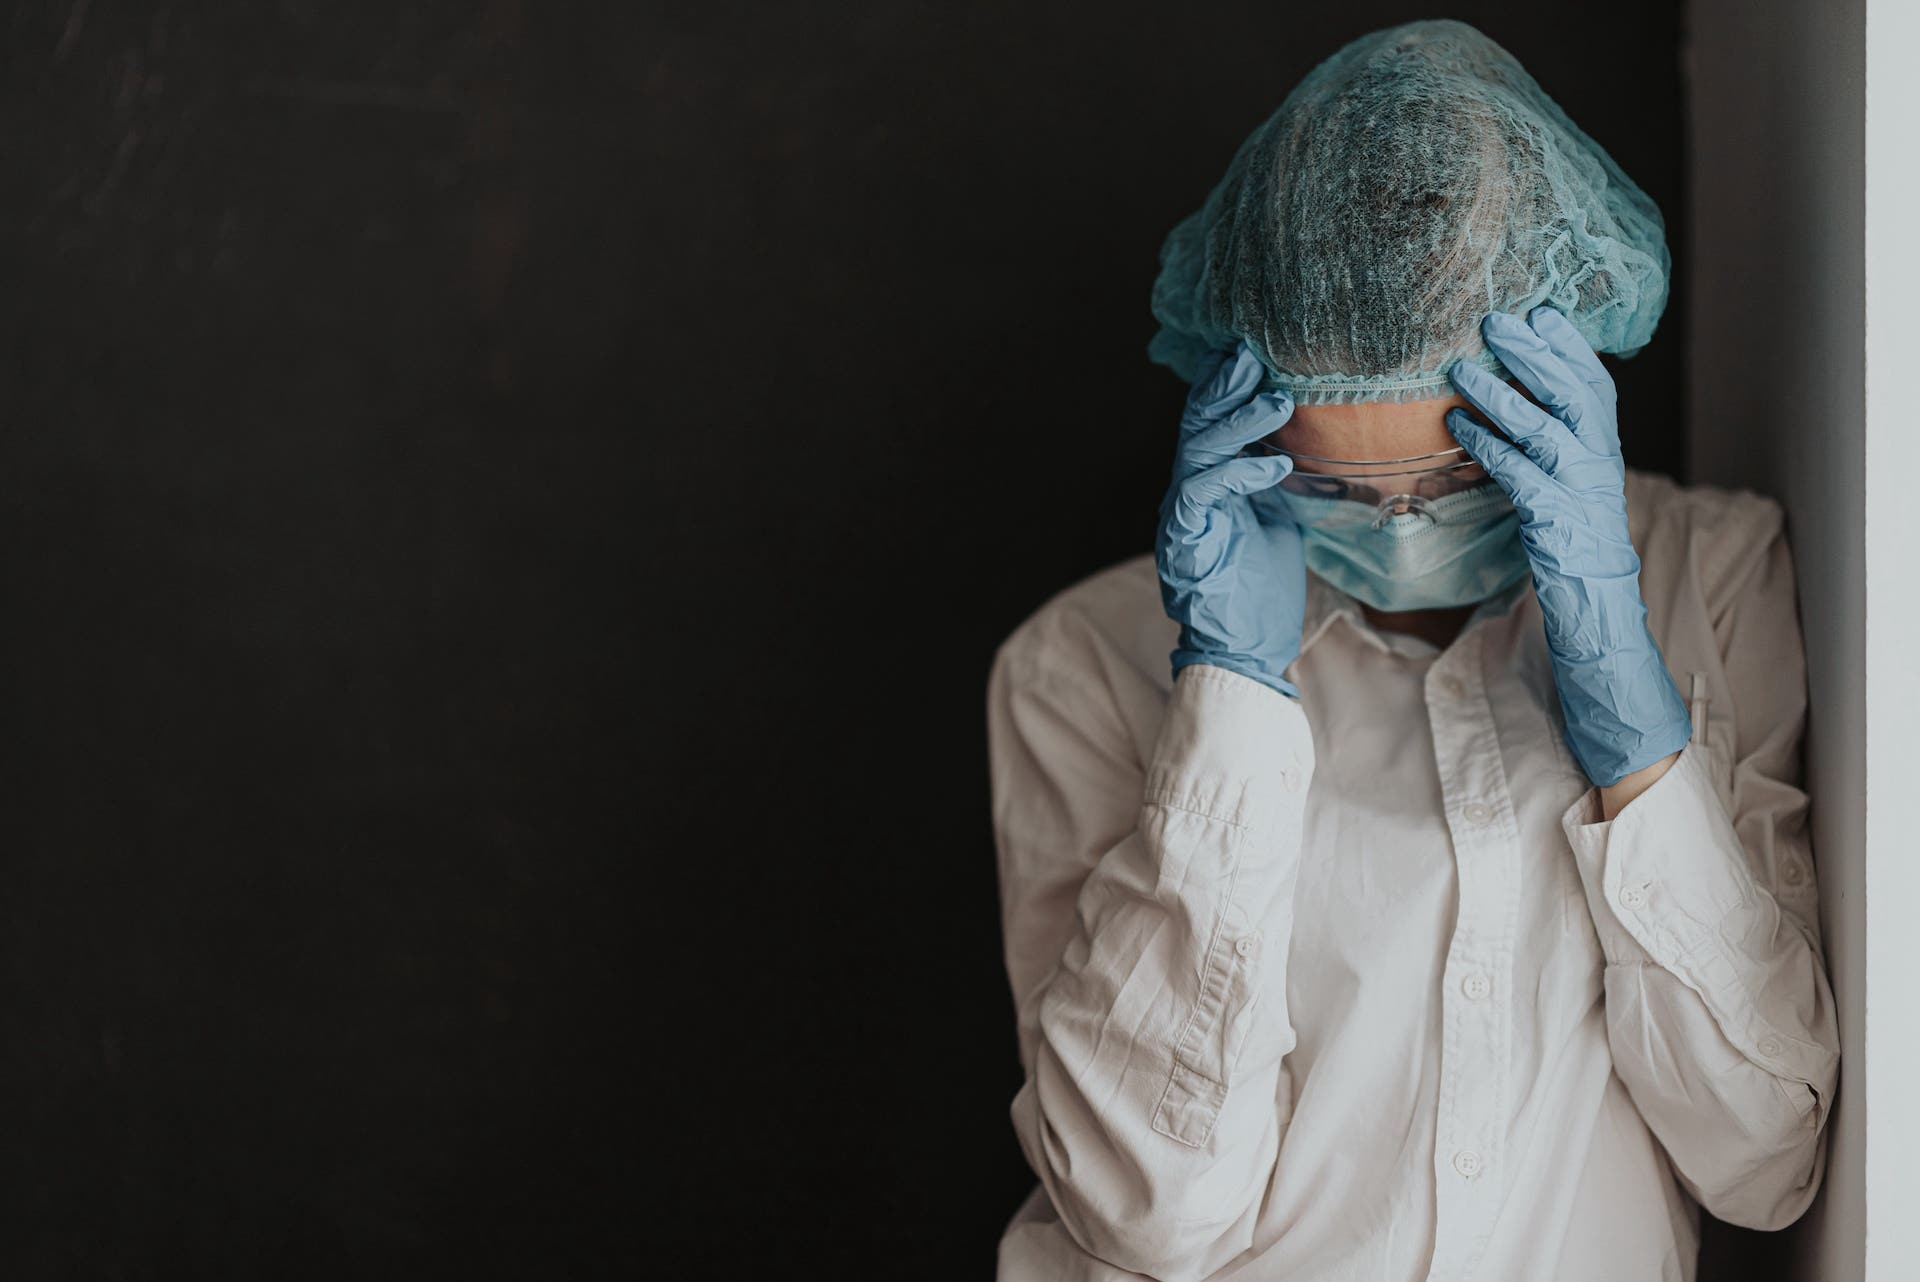 Sick of Caring - NURSING ONLY